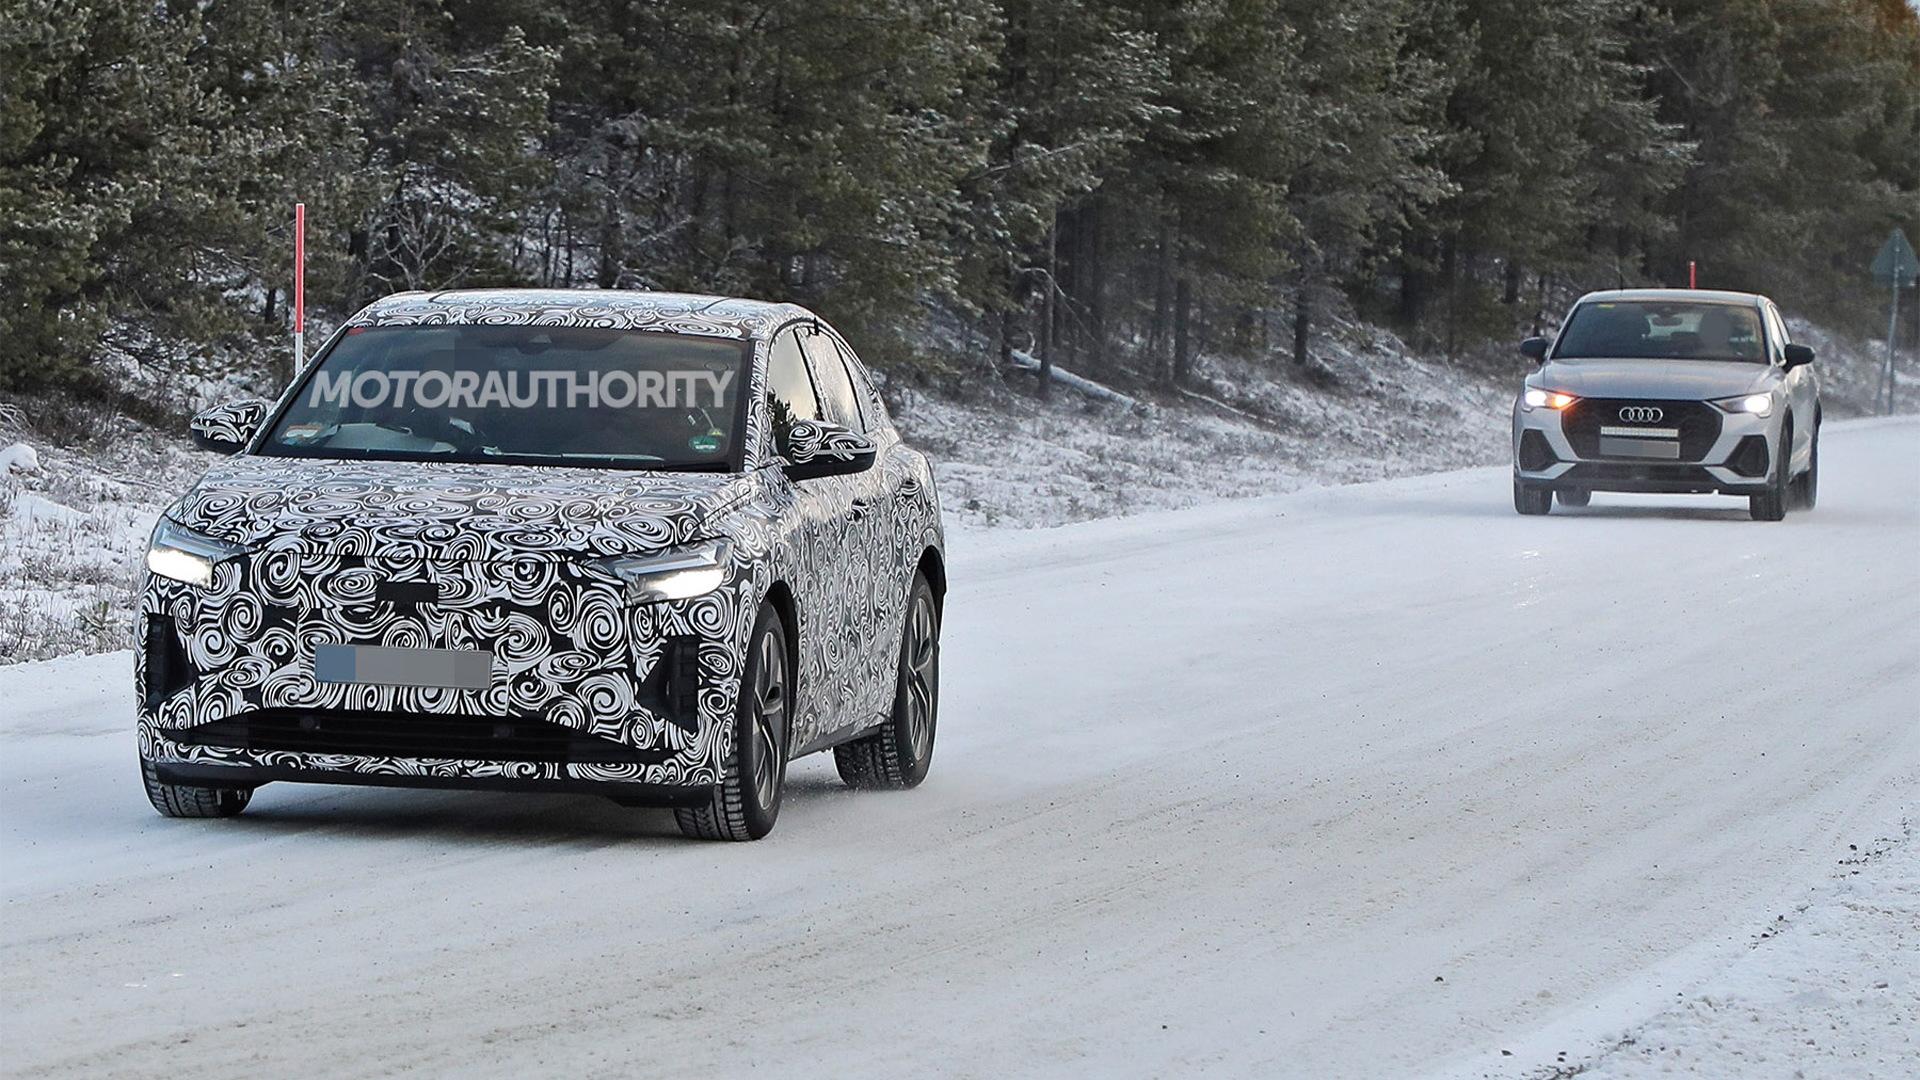 2022 Audi Q4 Sportback E-Tron spy shots - Photo credit: S. Baldauf/SB-Medien